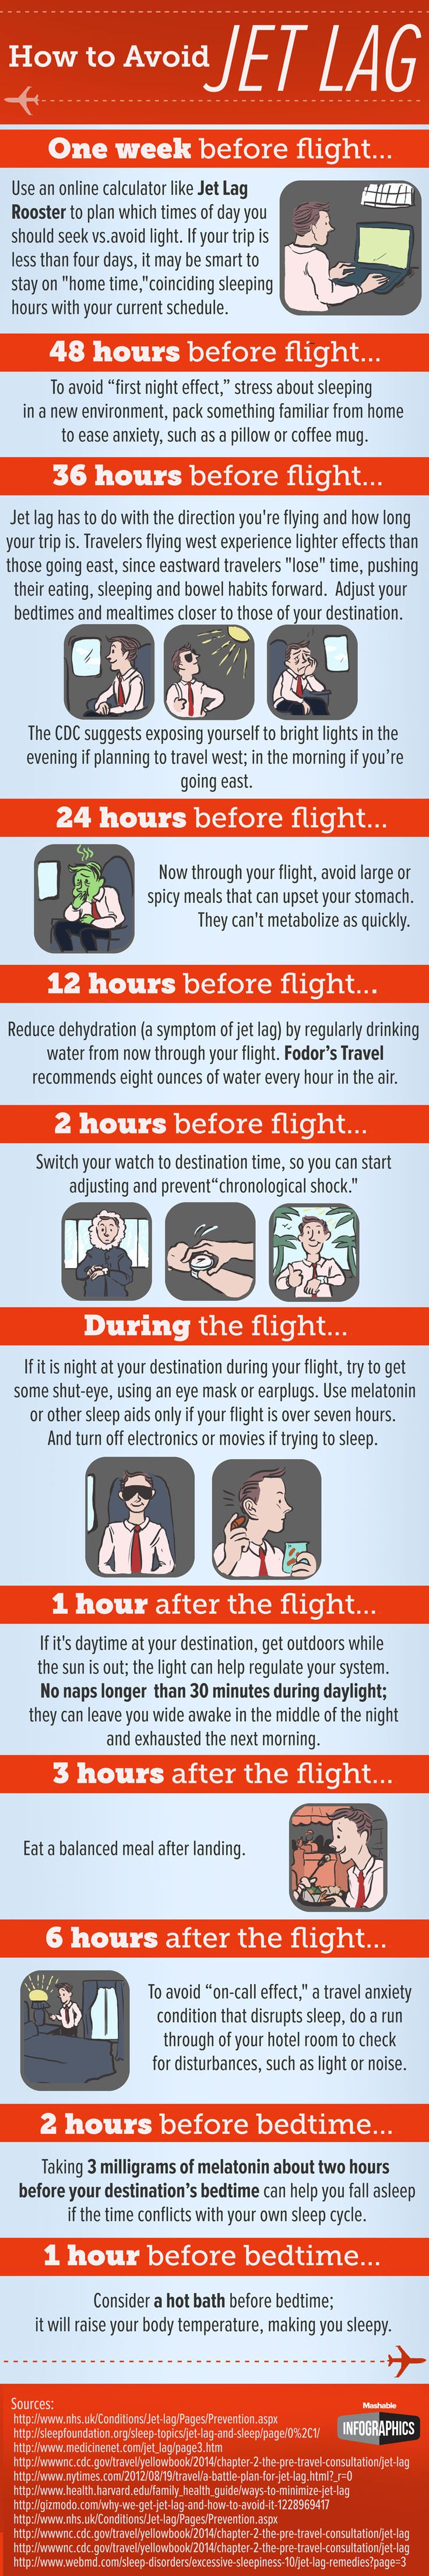 How To Avoid Jet lag via Mashable